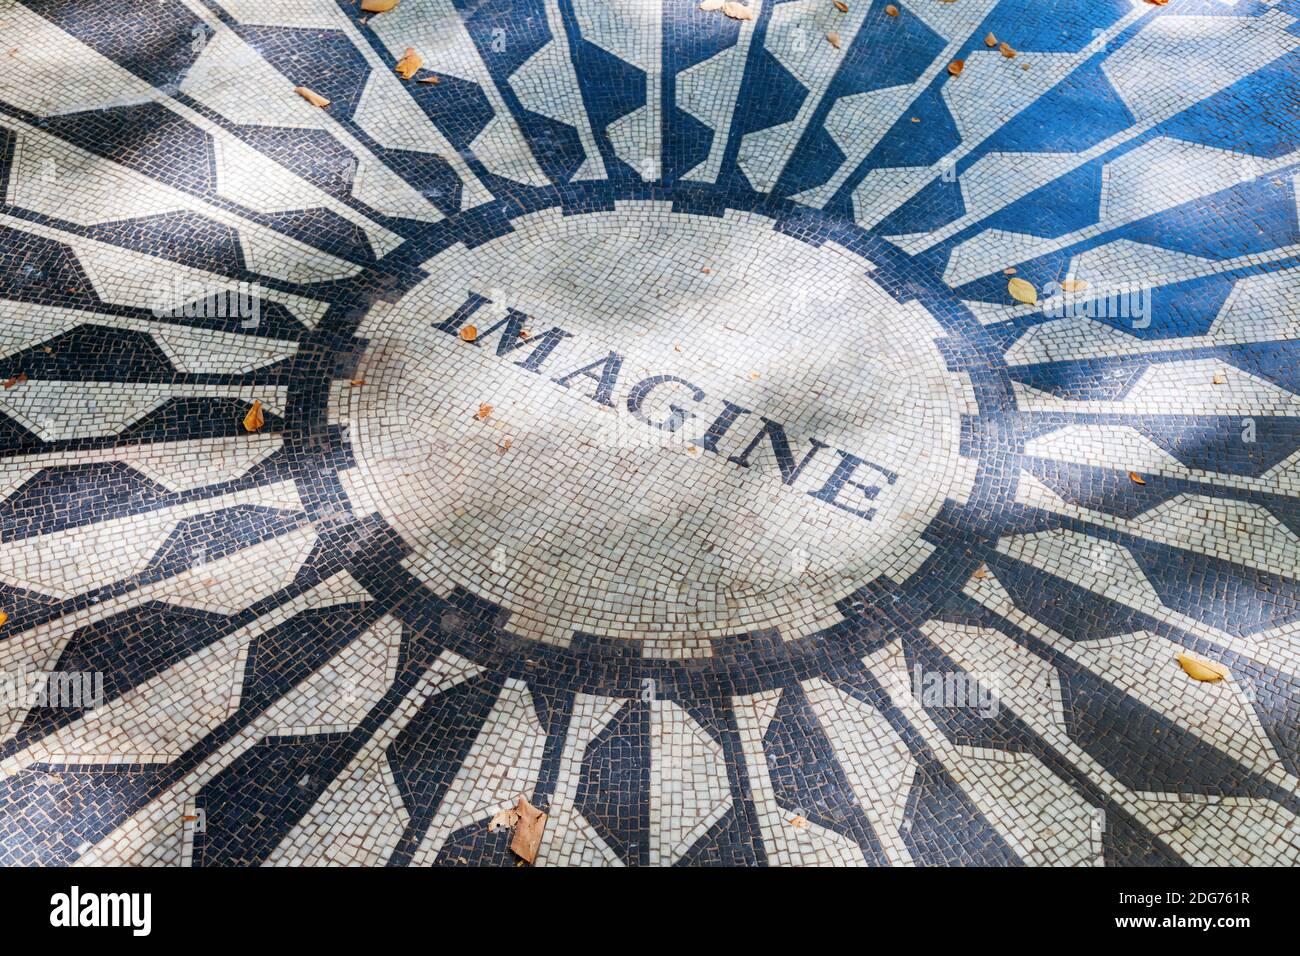 John Lennon - Imagine el mosaico del monumento a Strawberry Fields en Central Park, Nueva York Foto de stock